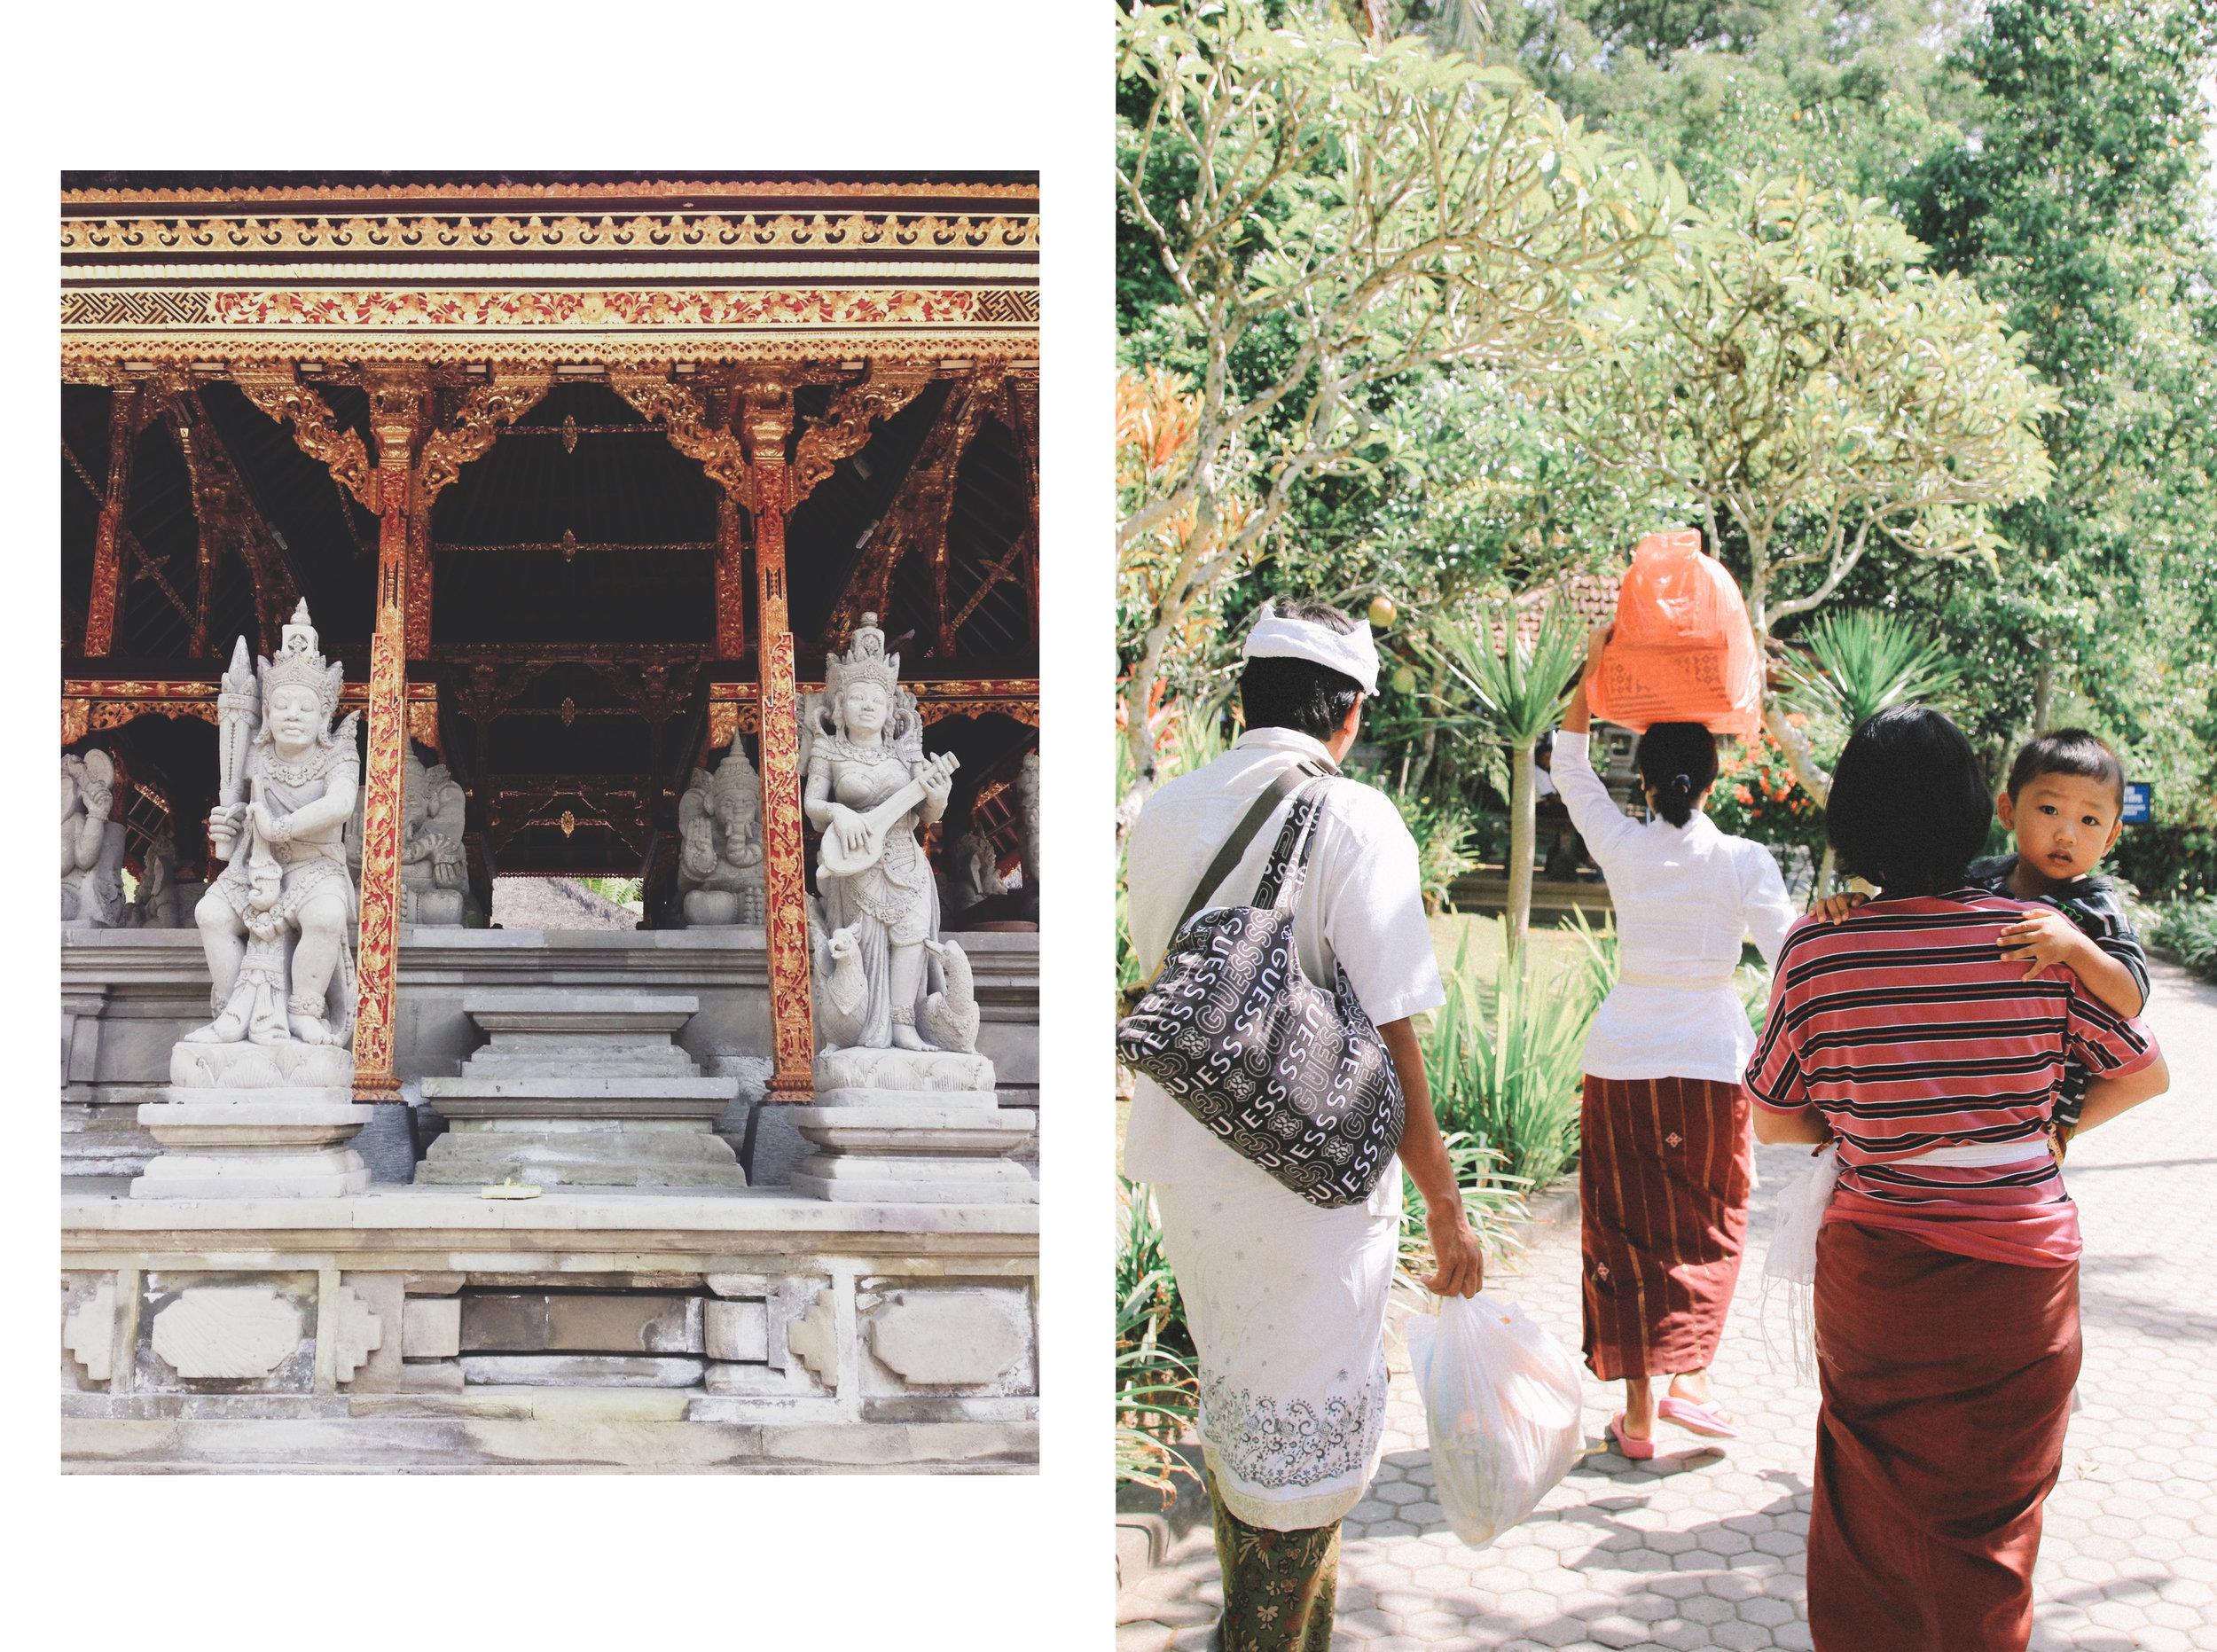 tirta-empul-temple-blog-onmywayFR-bali.jpg